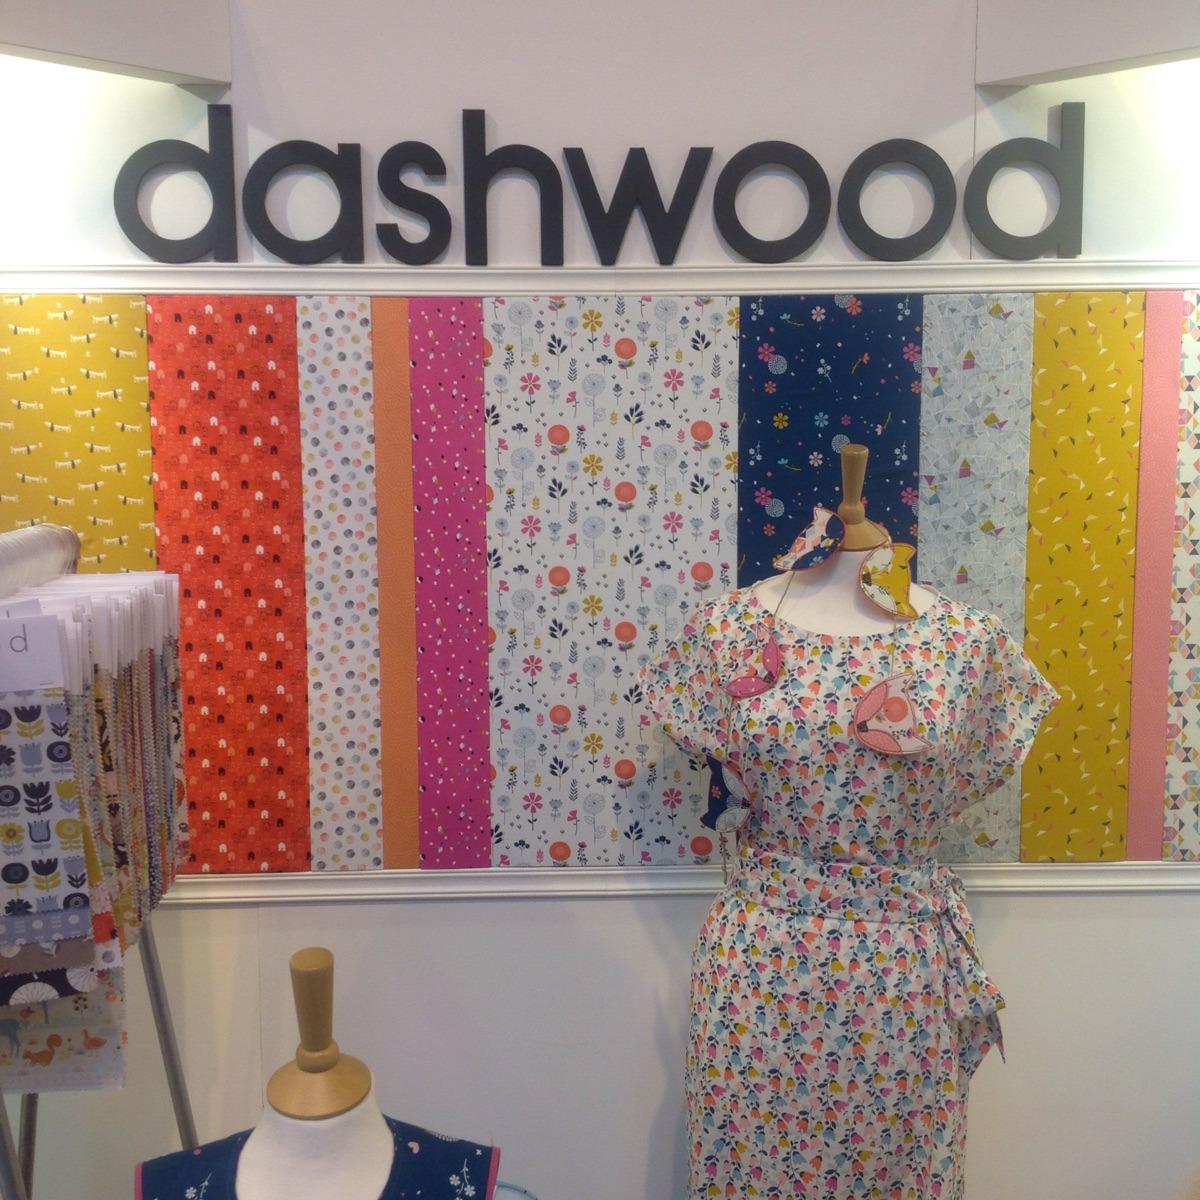 dashwood studio (@dashwoodstudio) Cover Image